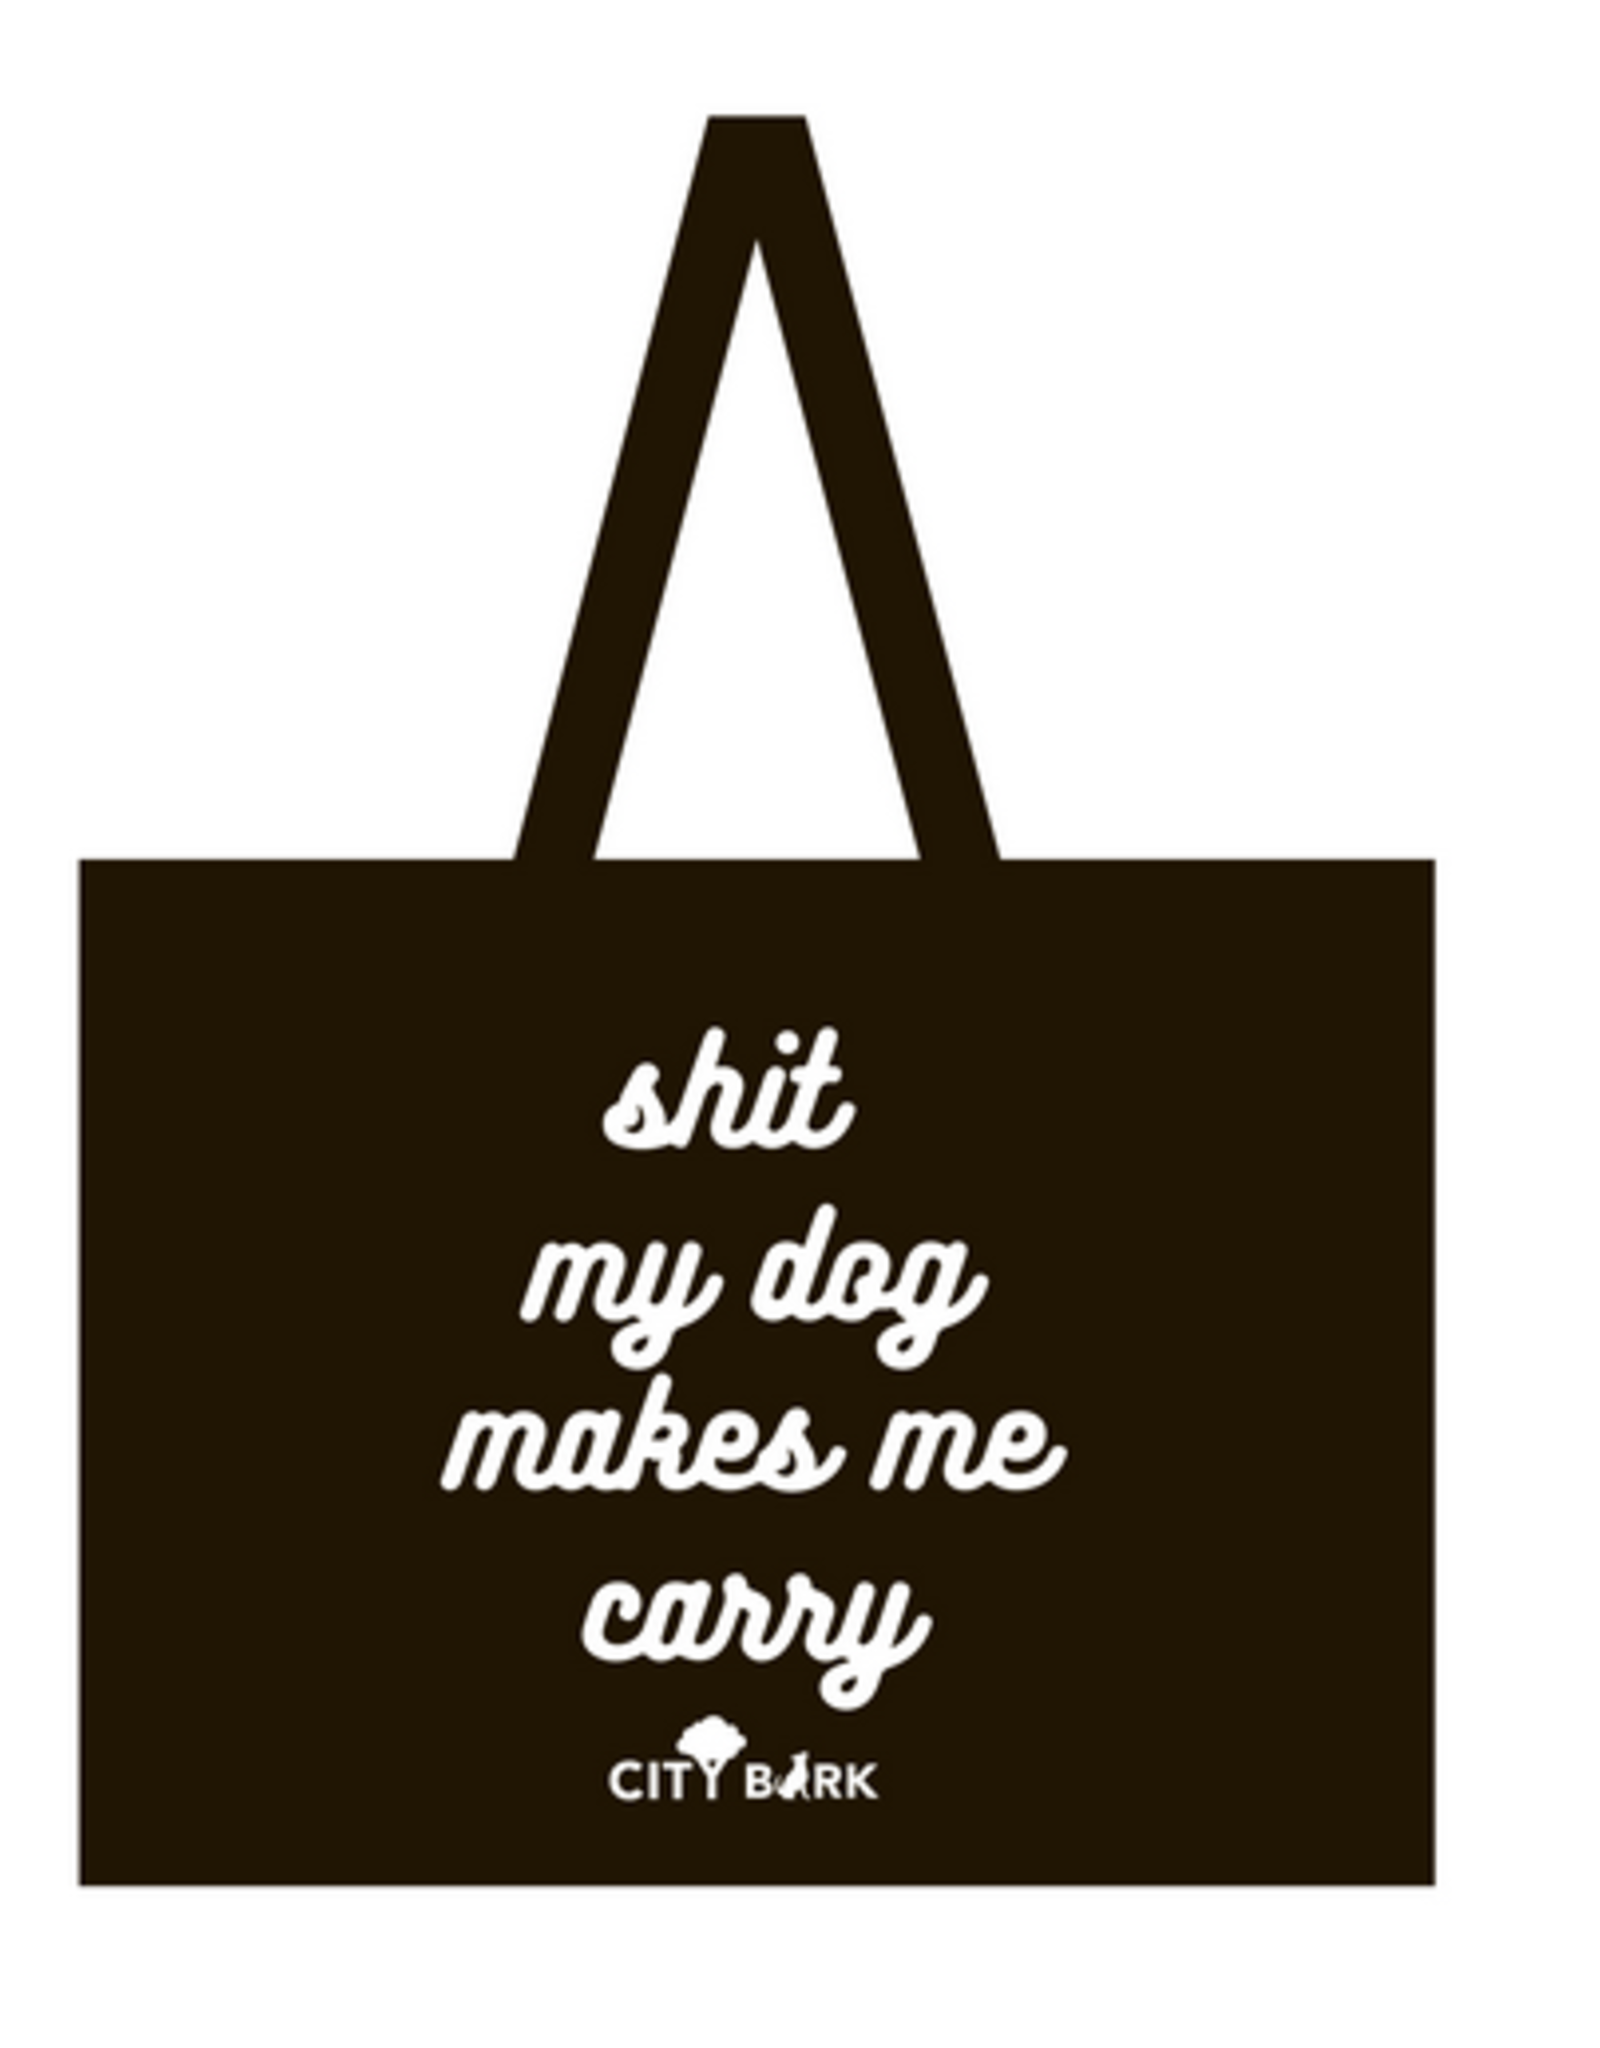 City Bark Sh*t for My Dog Tote Bag